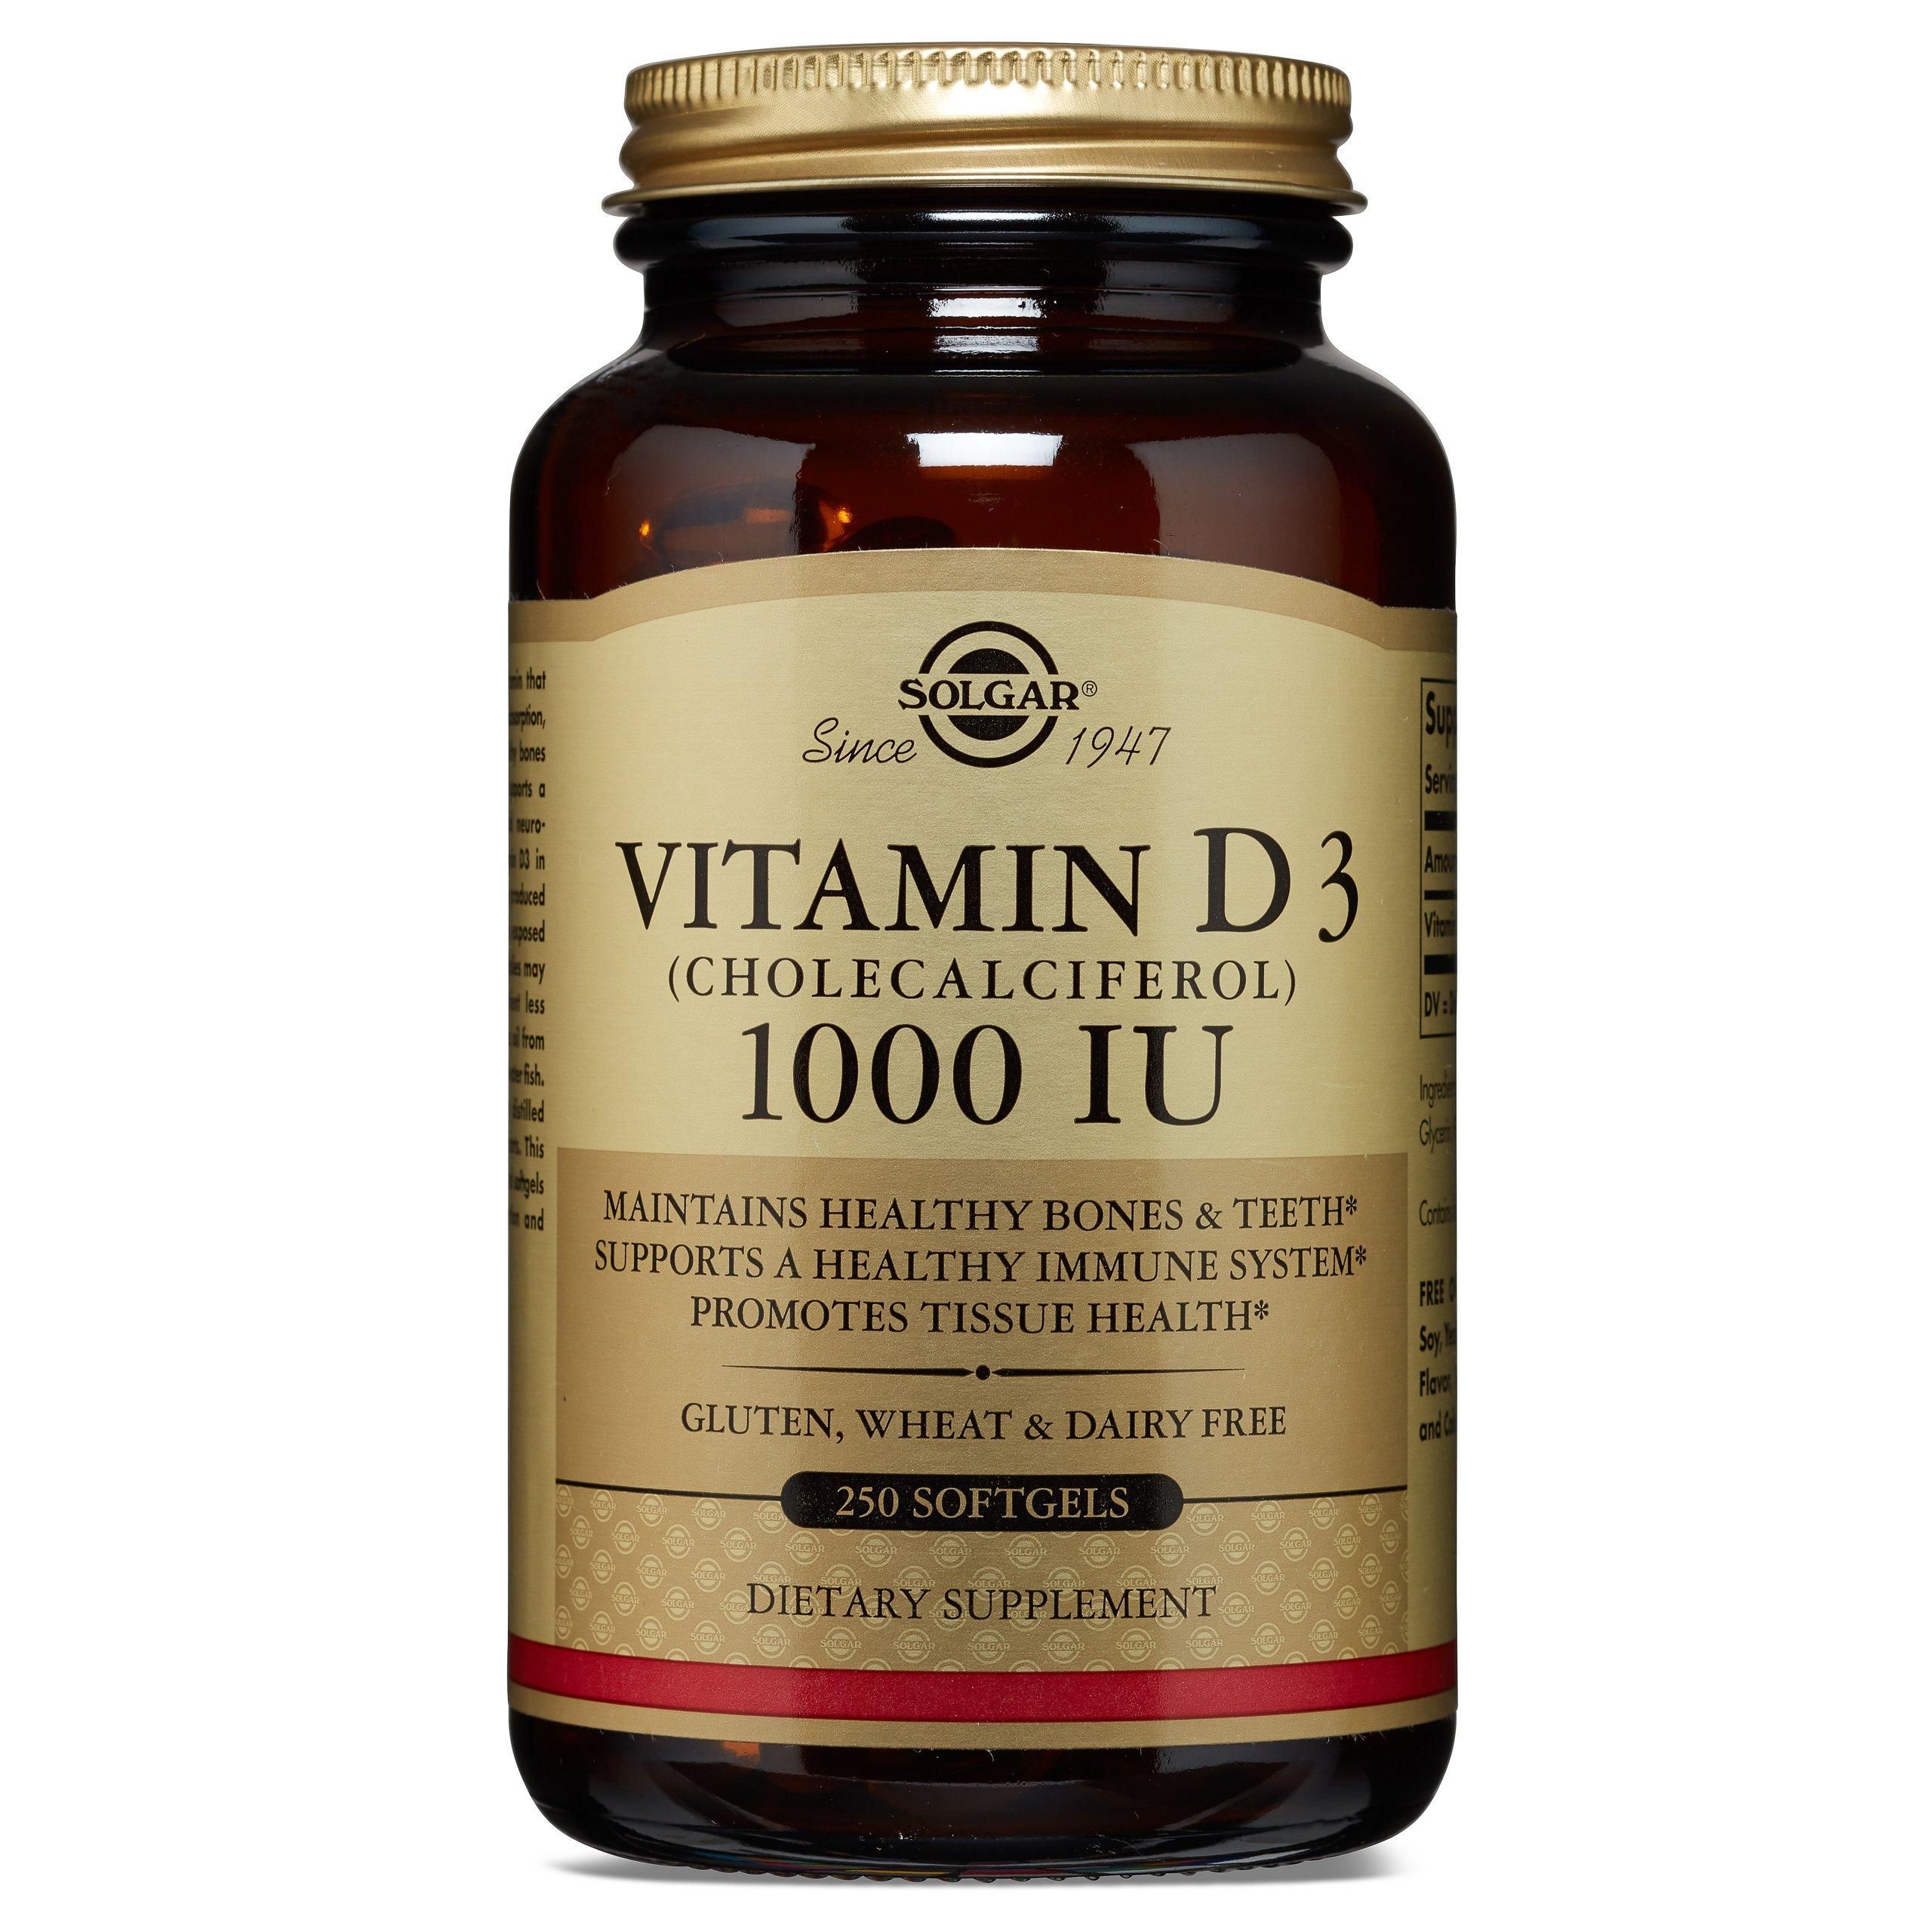 Solgar - Vitamin D3 (Cholecalciferol) 1,000 IU 250 Softgels